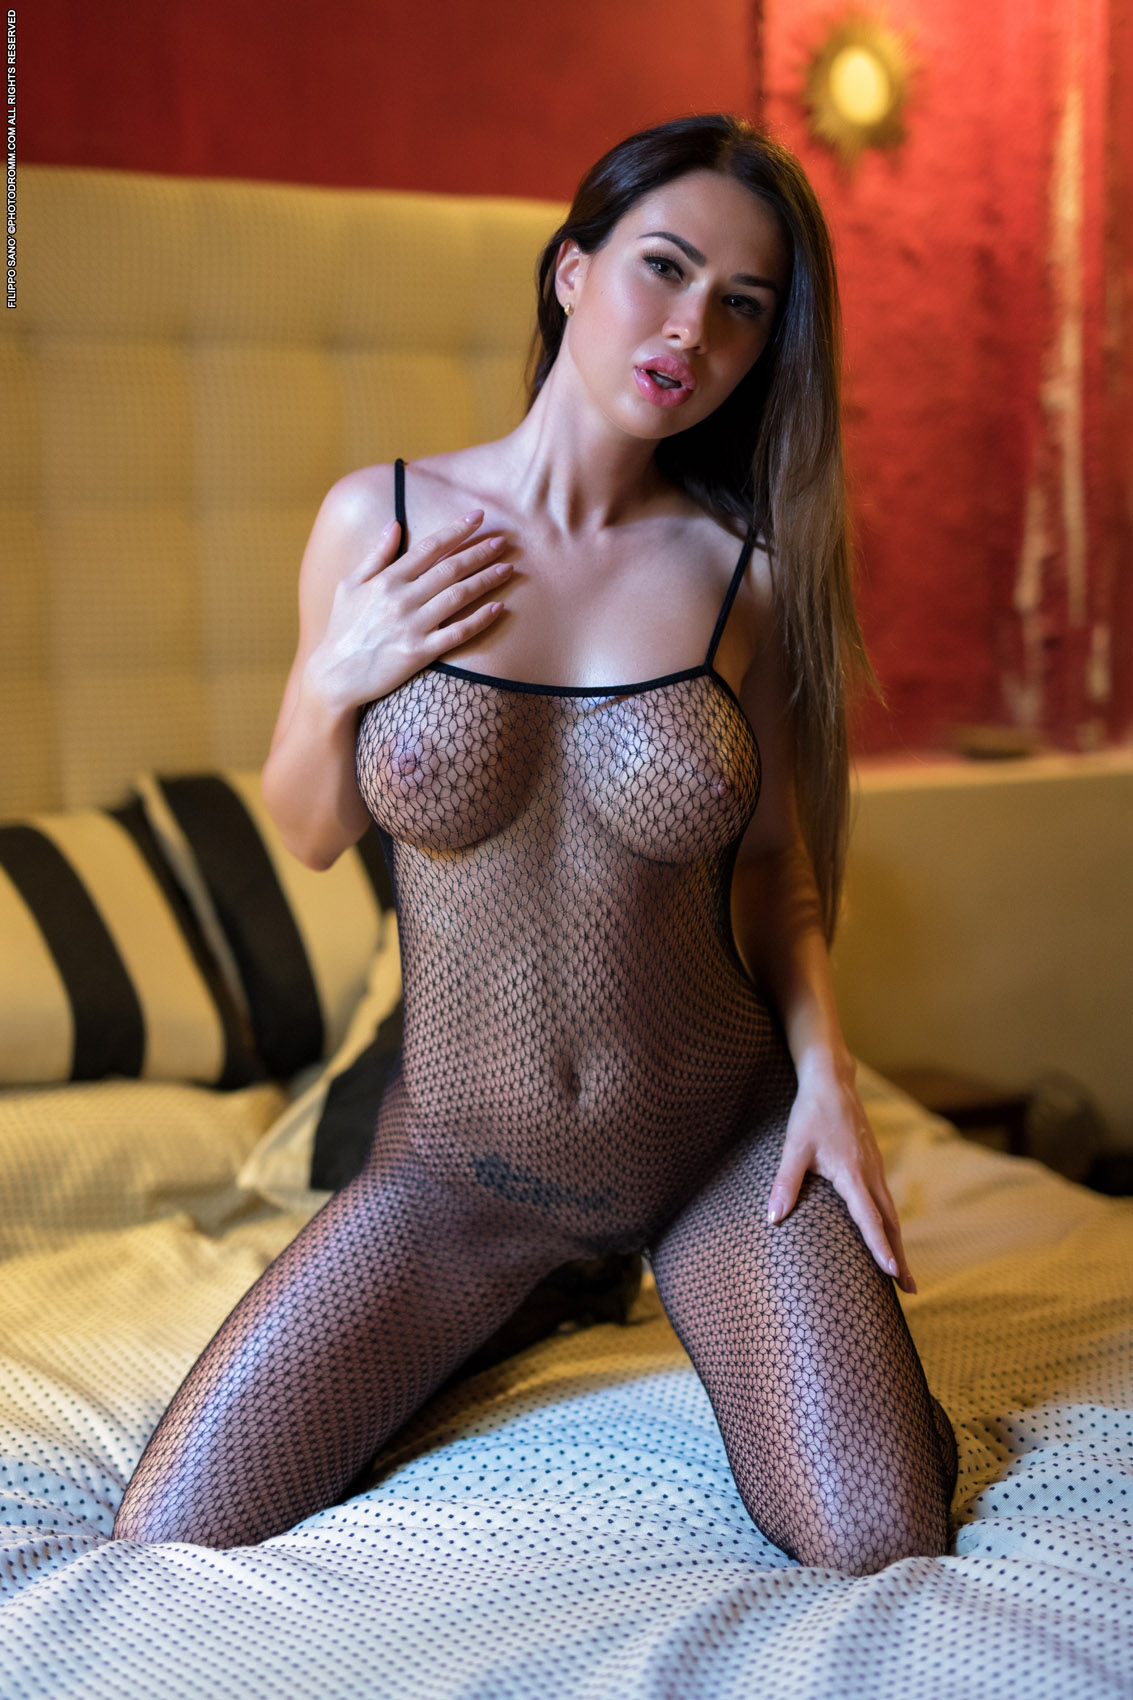 busty-shaved-brunette-goddess-justyna-with-big-naturals-wearing-fishnet-3.jpg